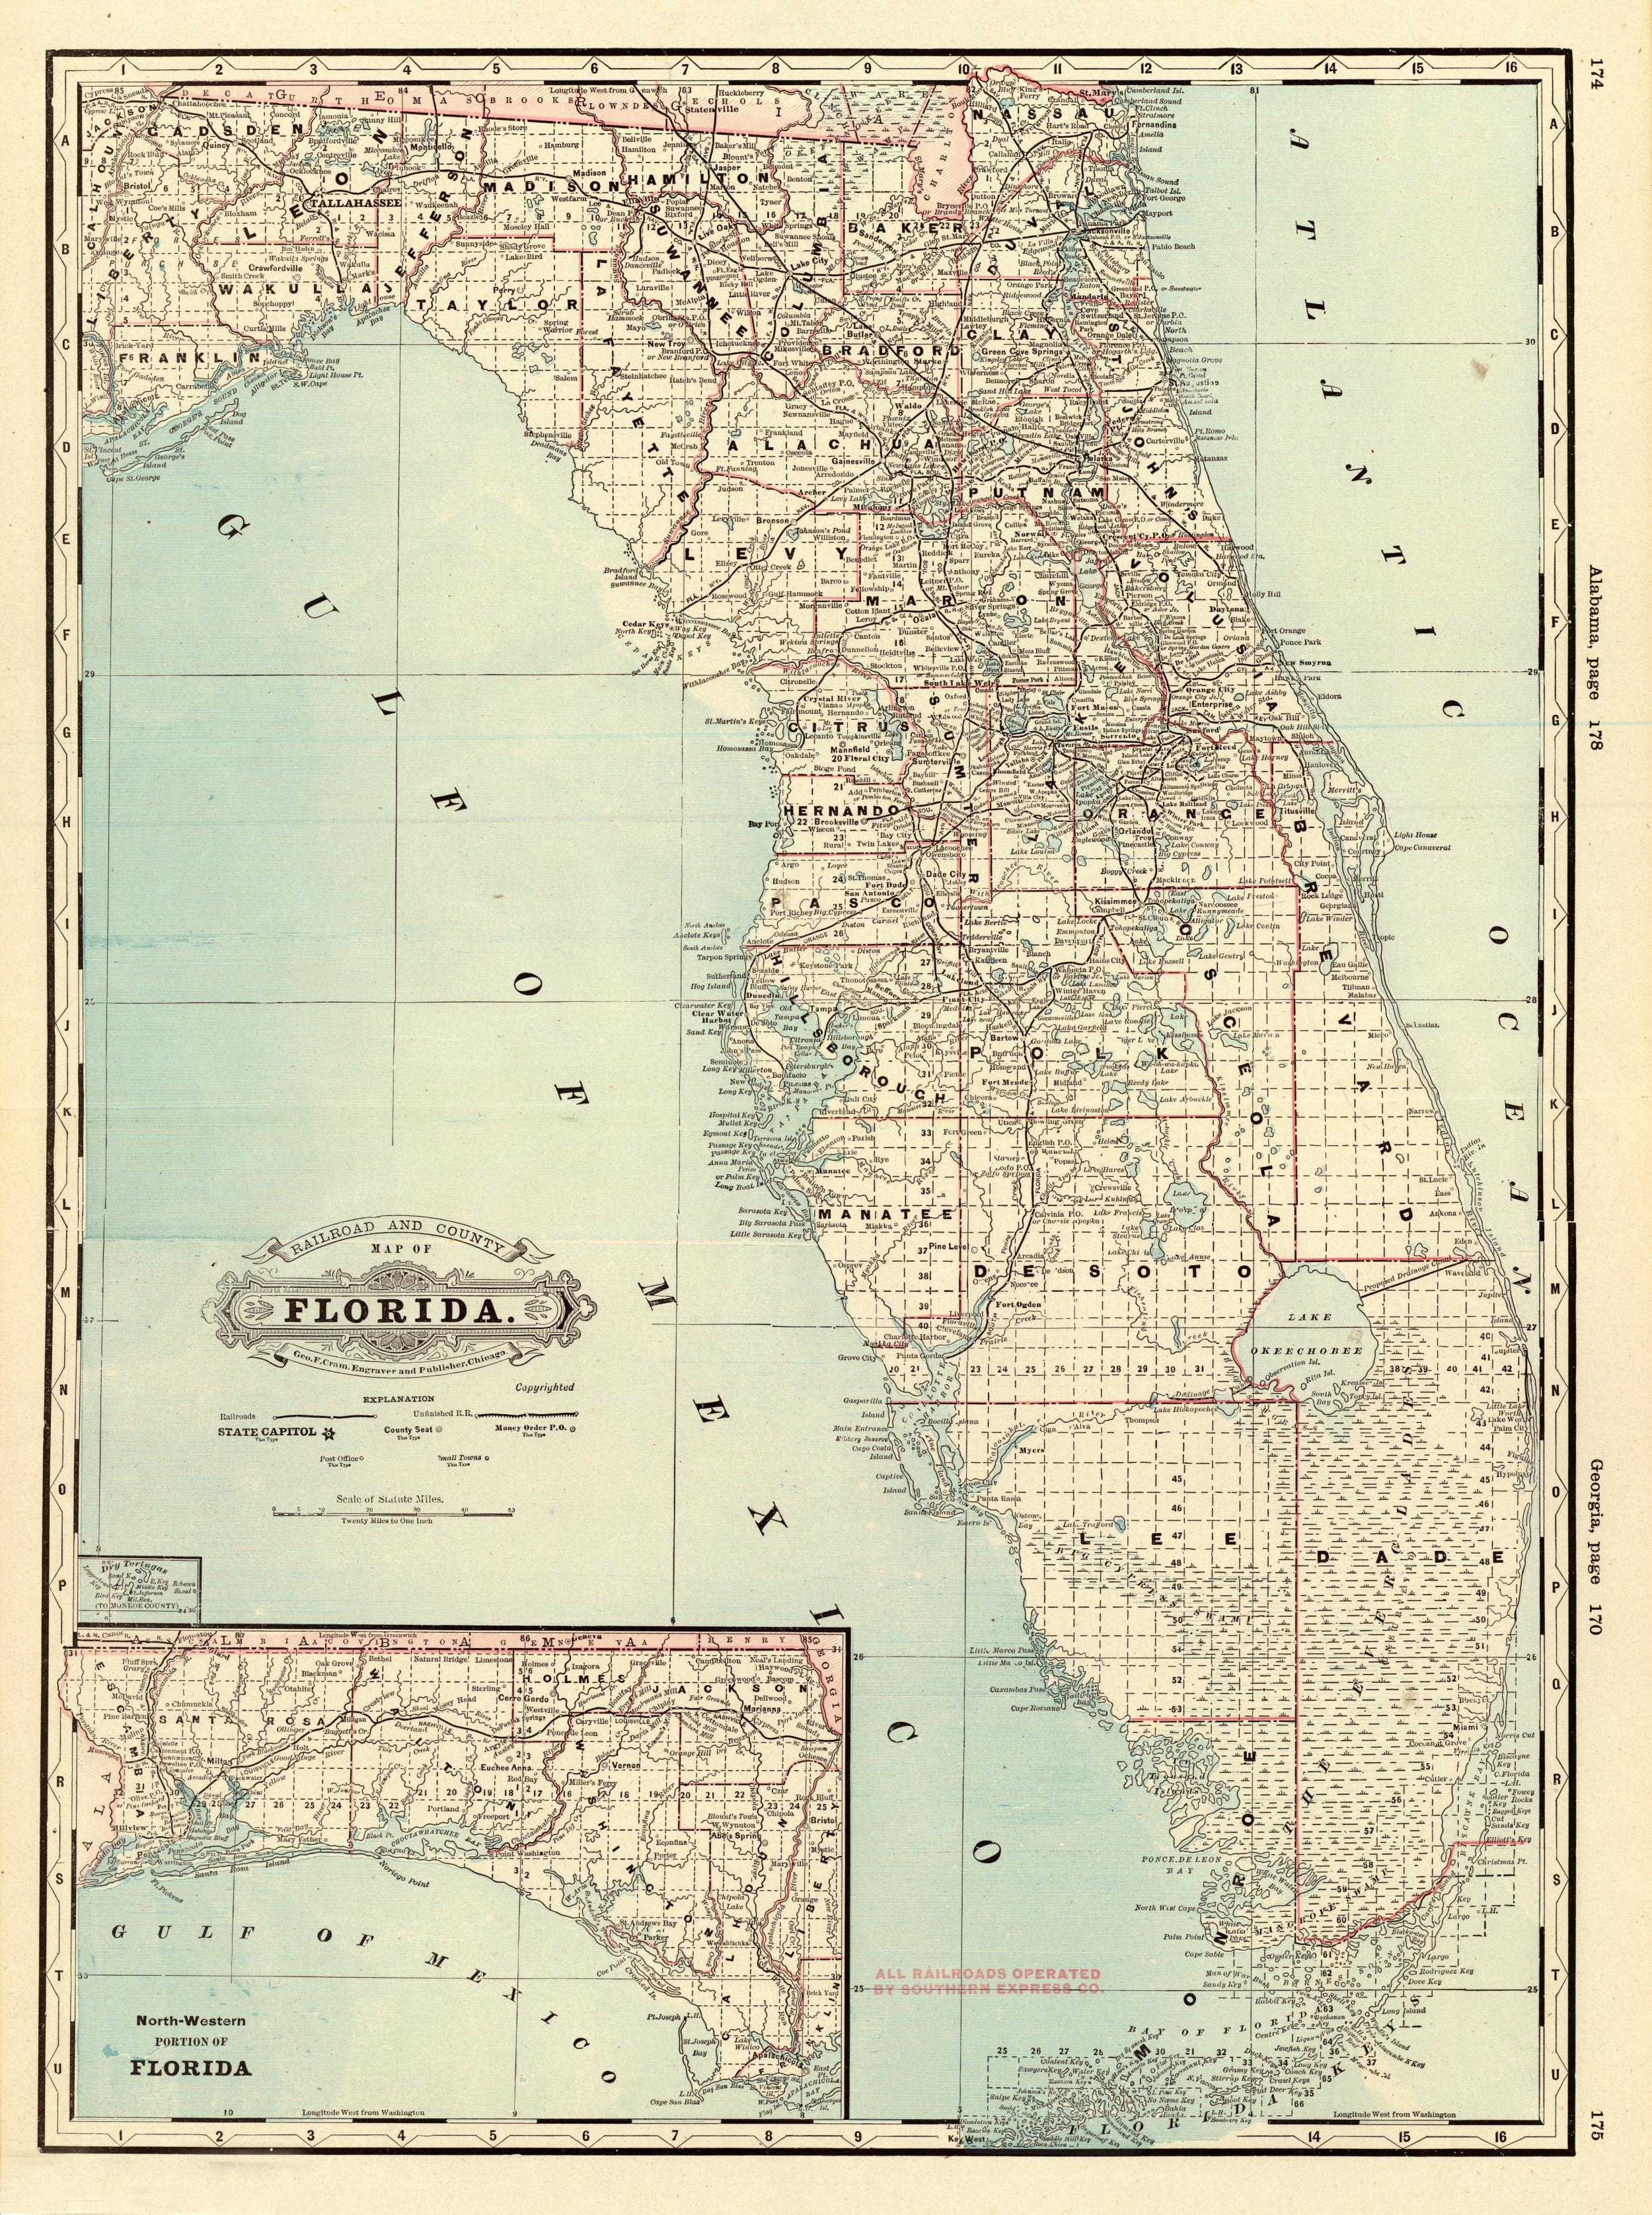 Florida Memory - County Map Of Florida, 1885 - Map Of Hernando County Florida